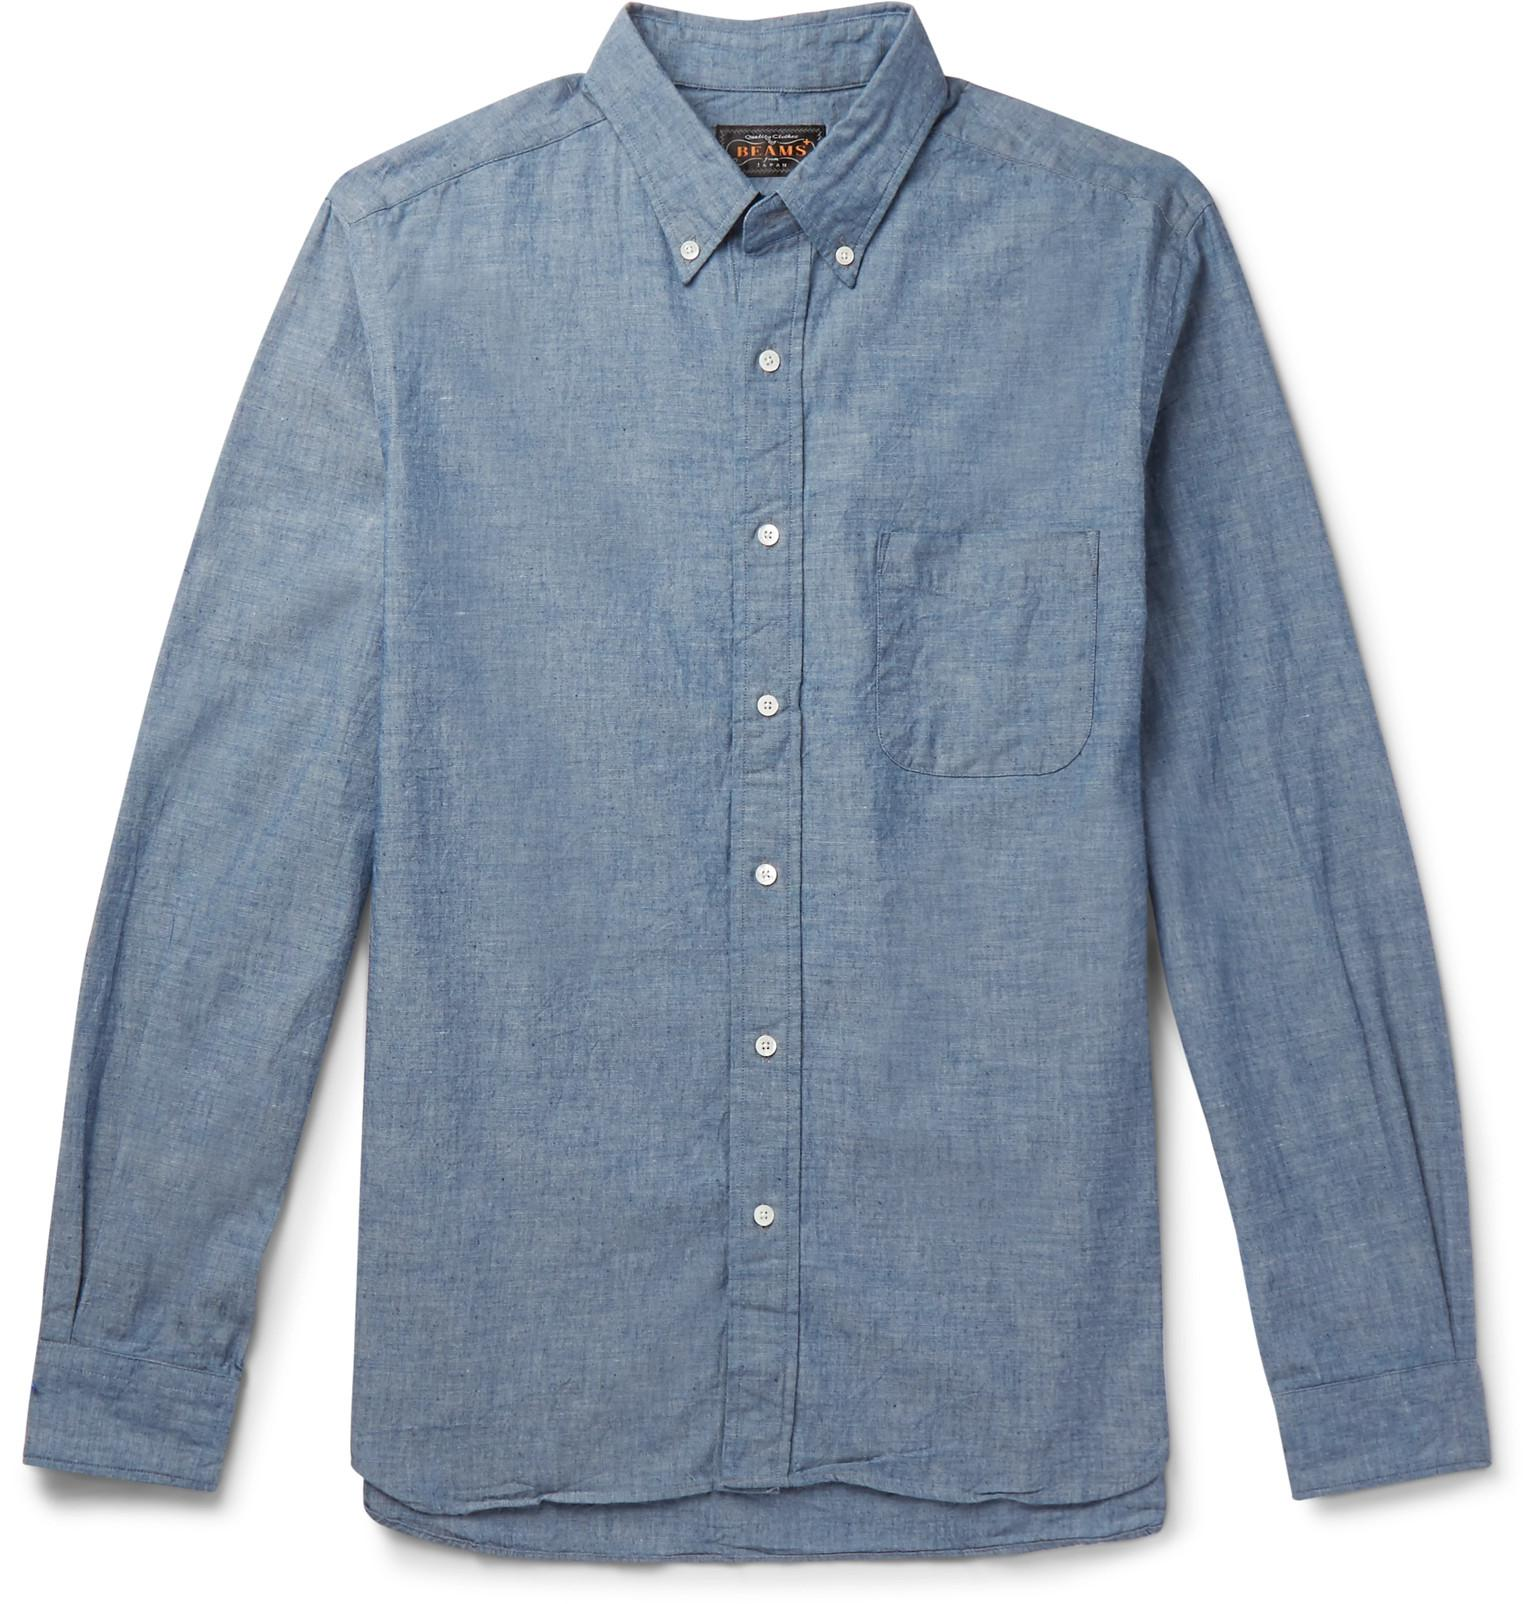 9e5404546ee Beams Plus Button-down Collar Cotton-chambray Shirt in Blue for Men ...